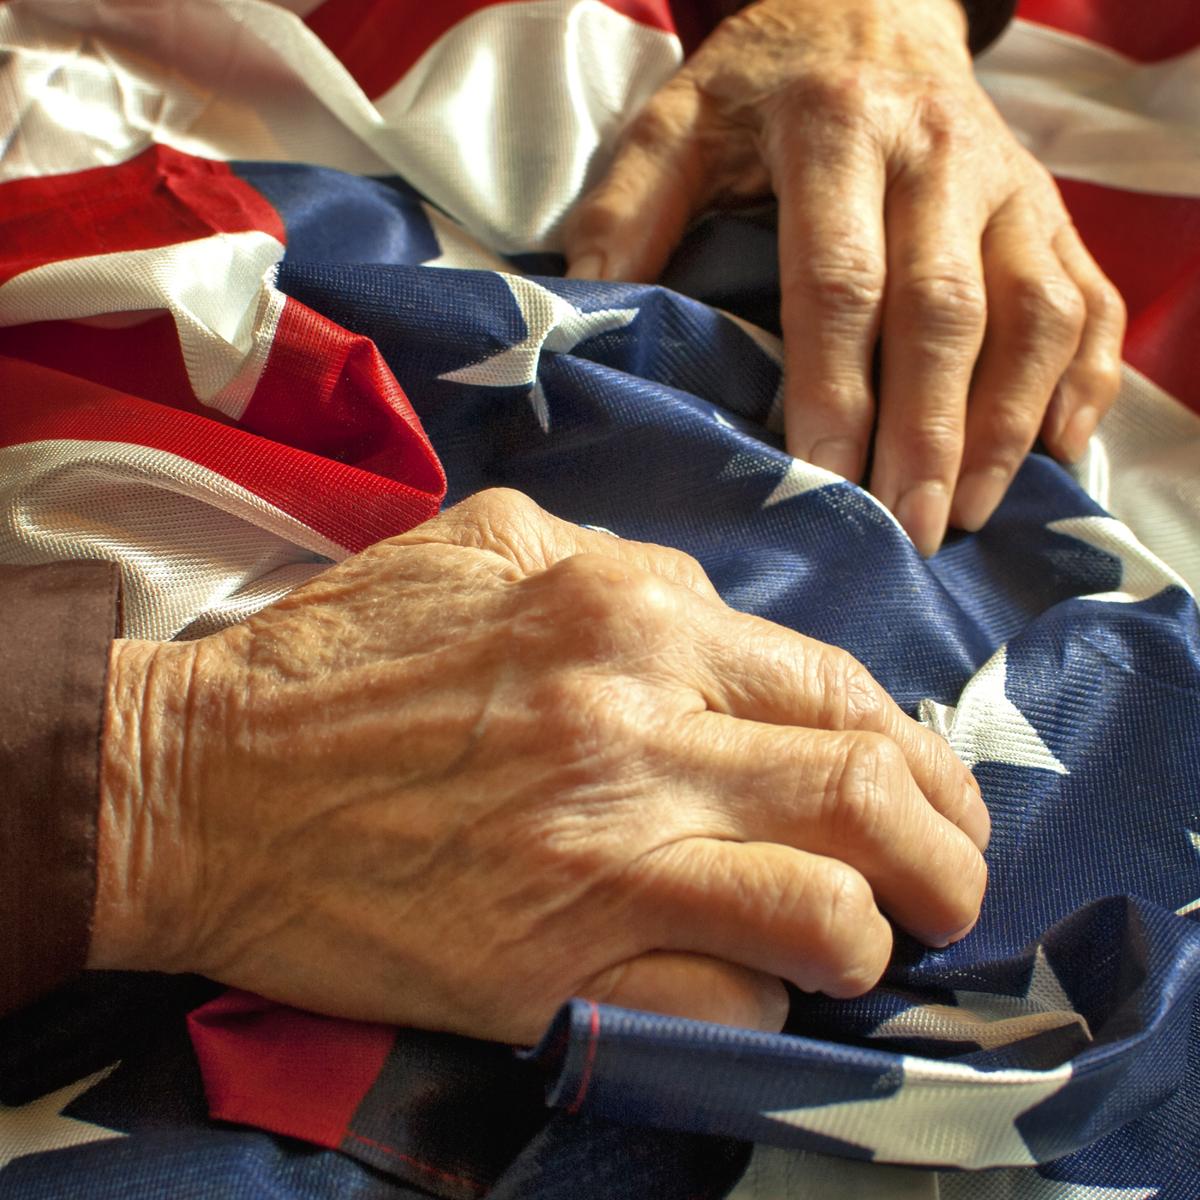 In home care for veterans through veterans assistance programs